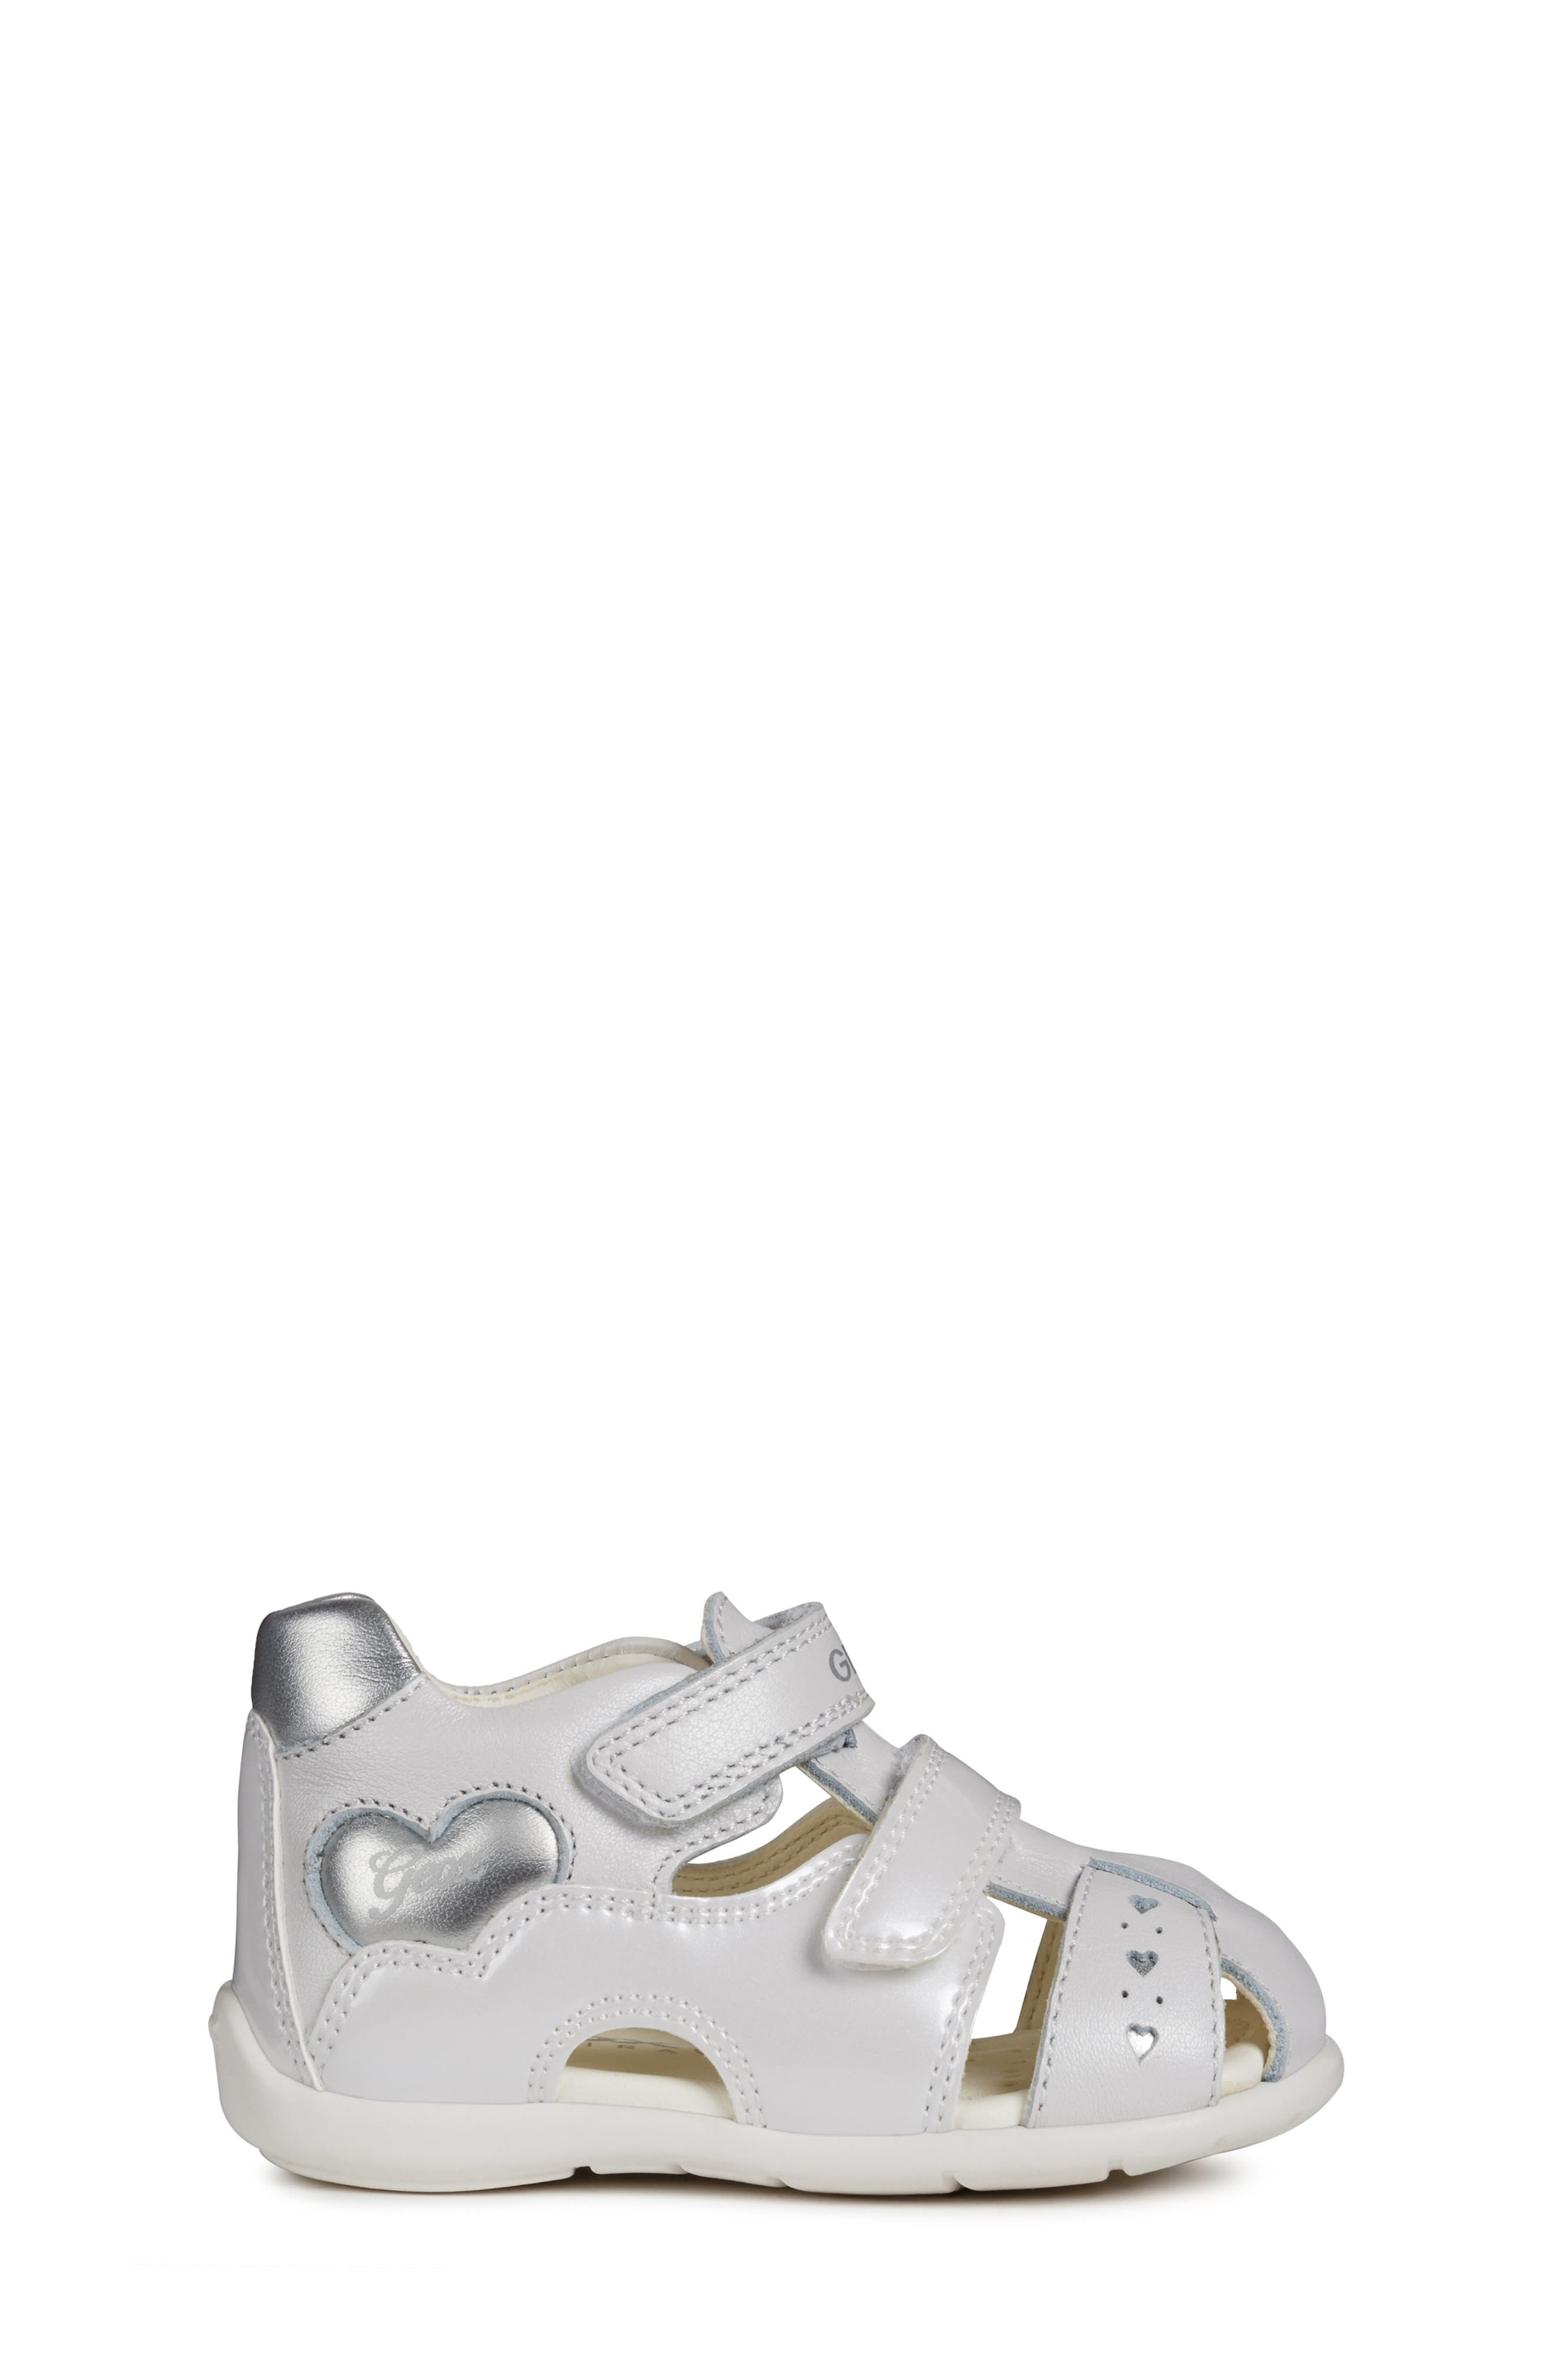 GEOX,                             Kaytan 52 Shimmery Sandal,                             Alternate thumbnail 3, color,                             WHITE/ SILVER